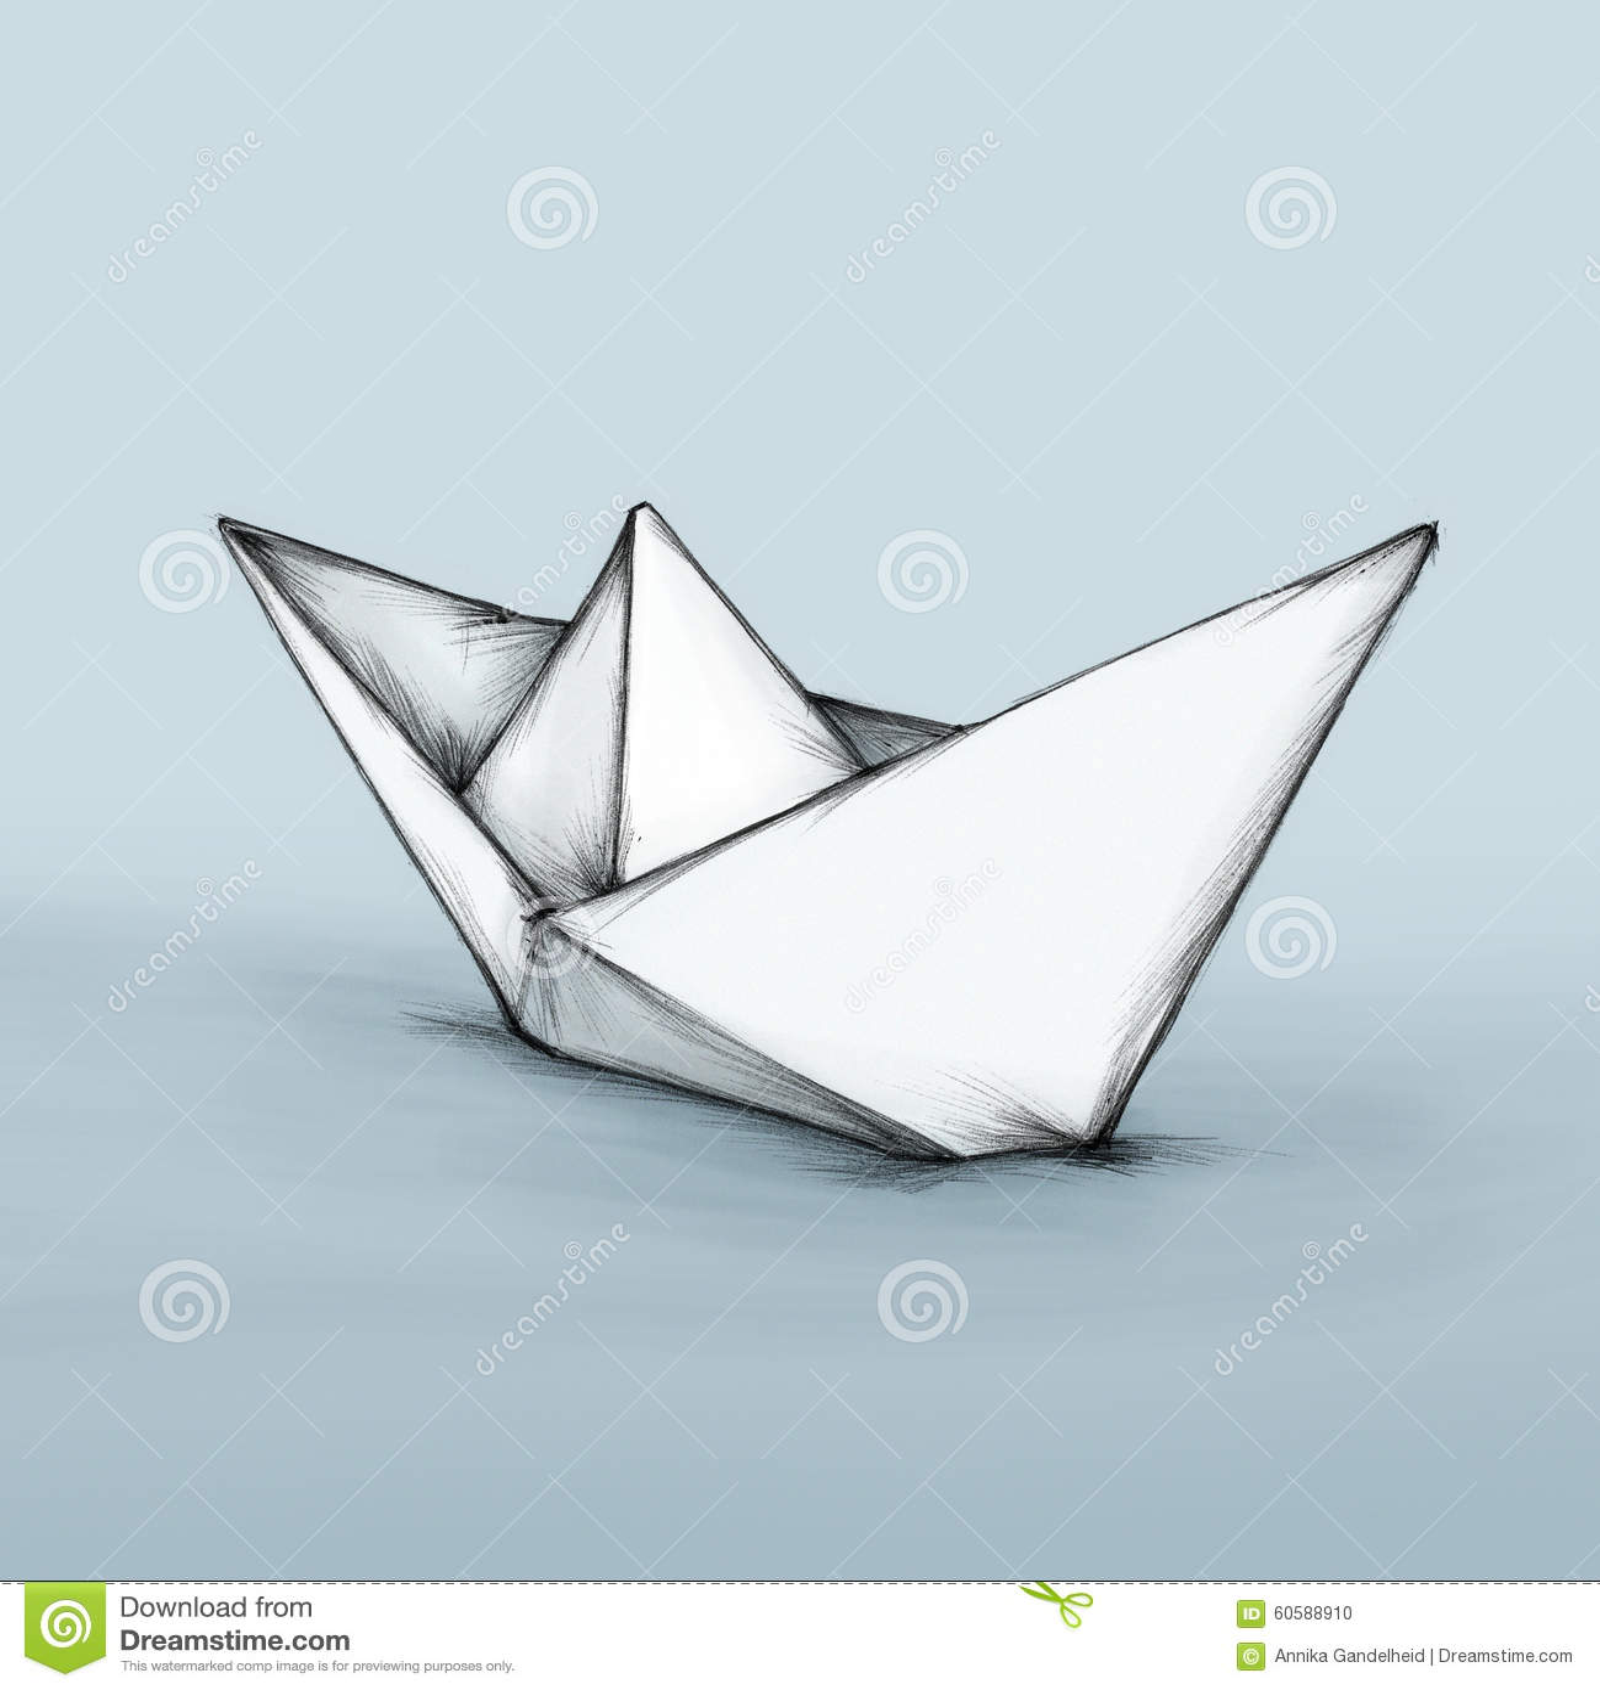 ship drawing paper - photo #31